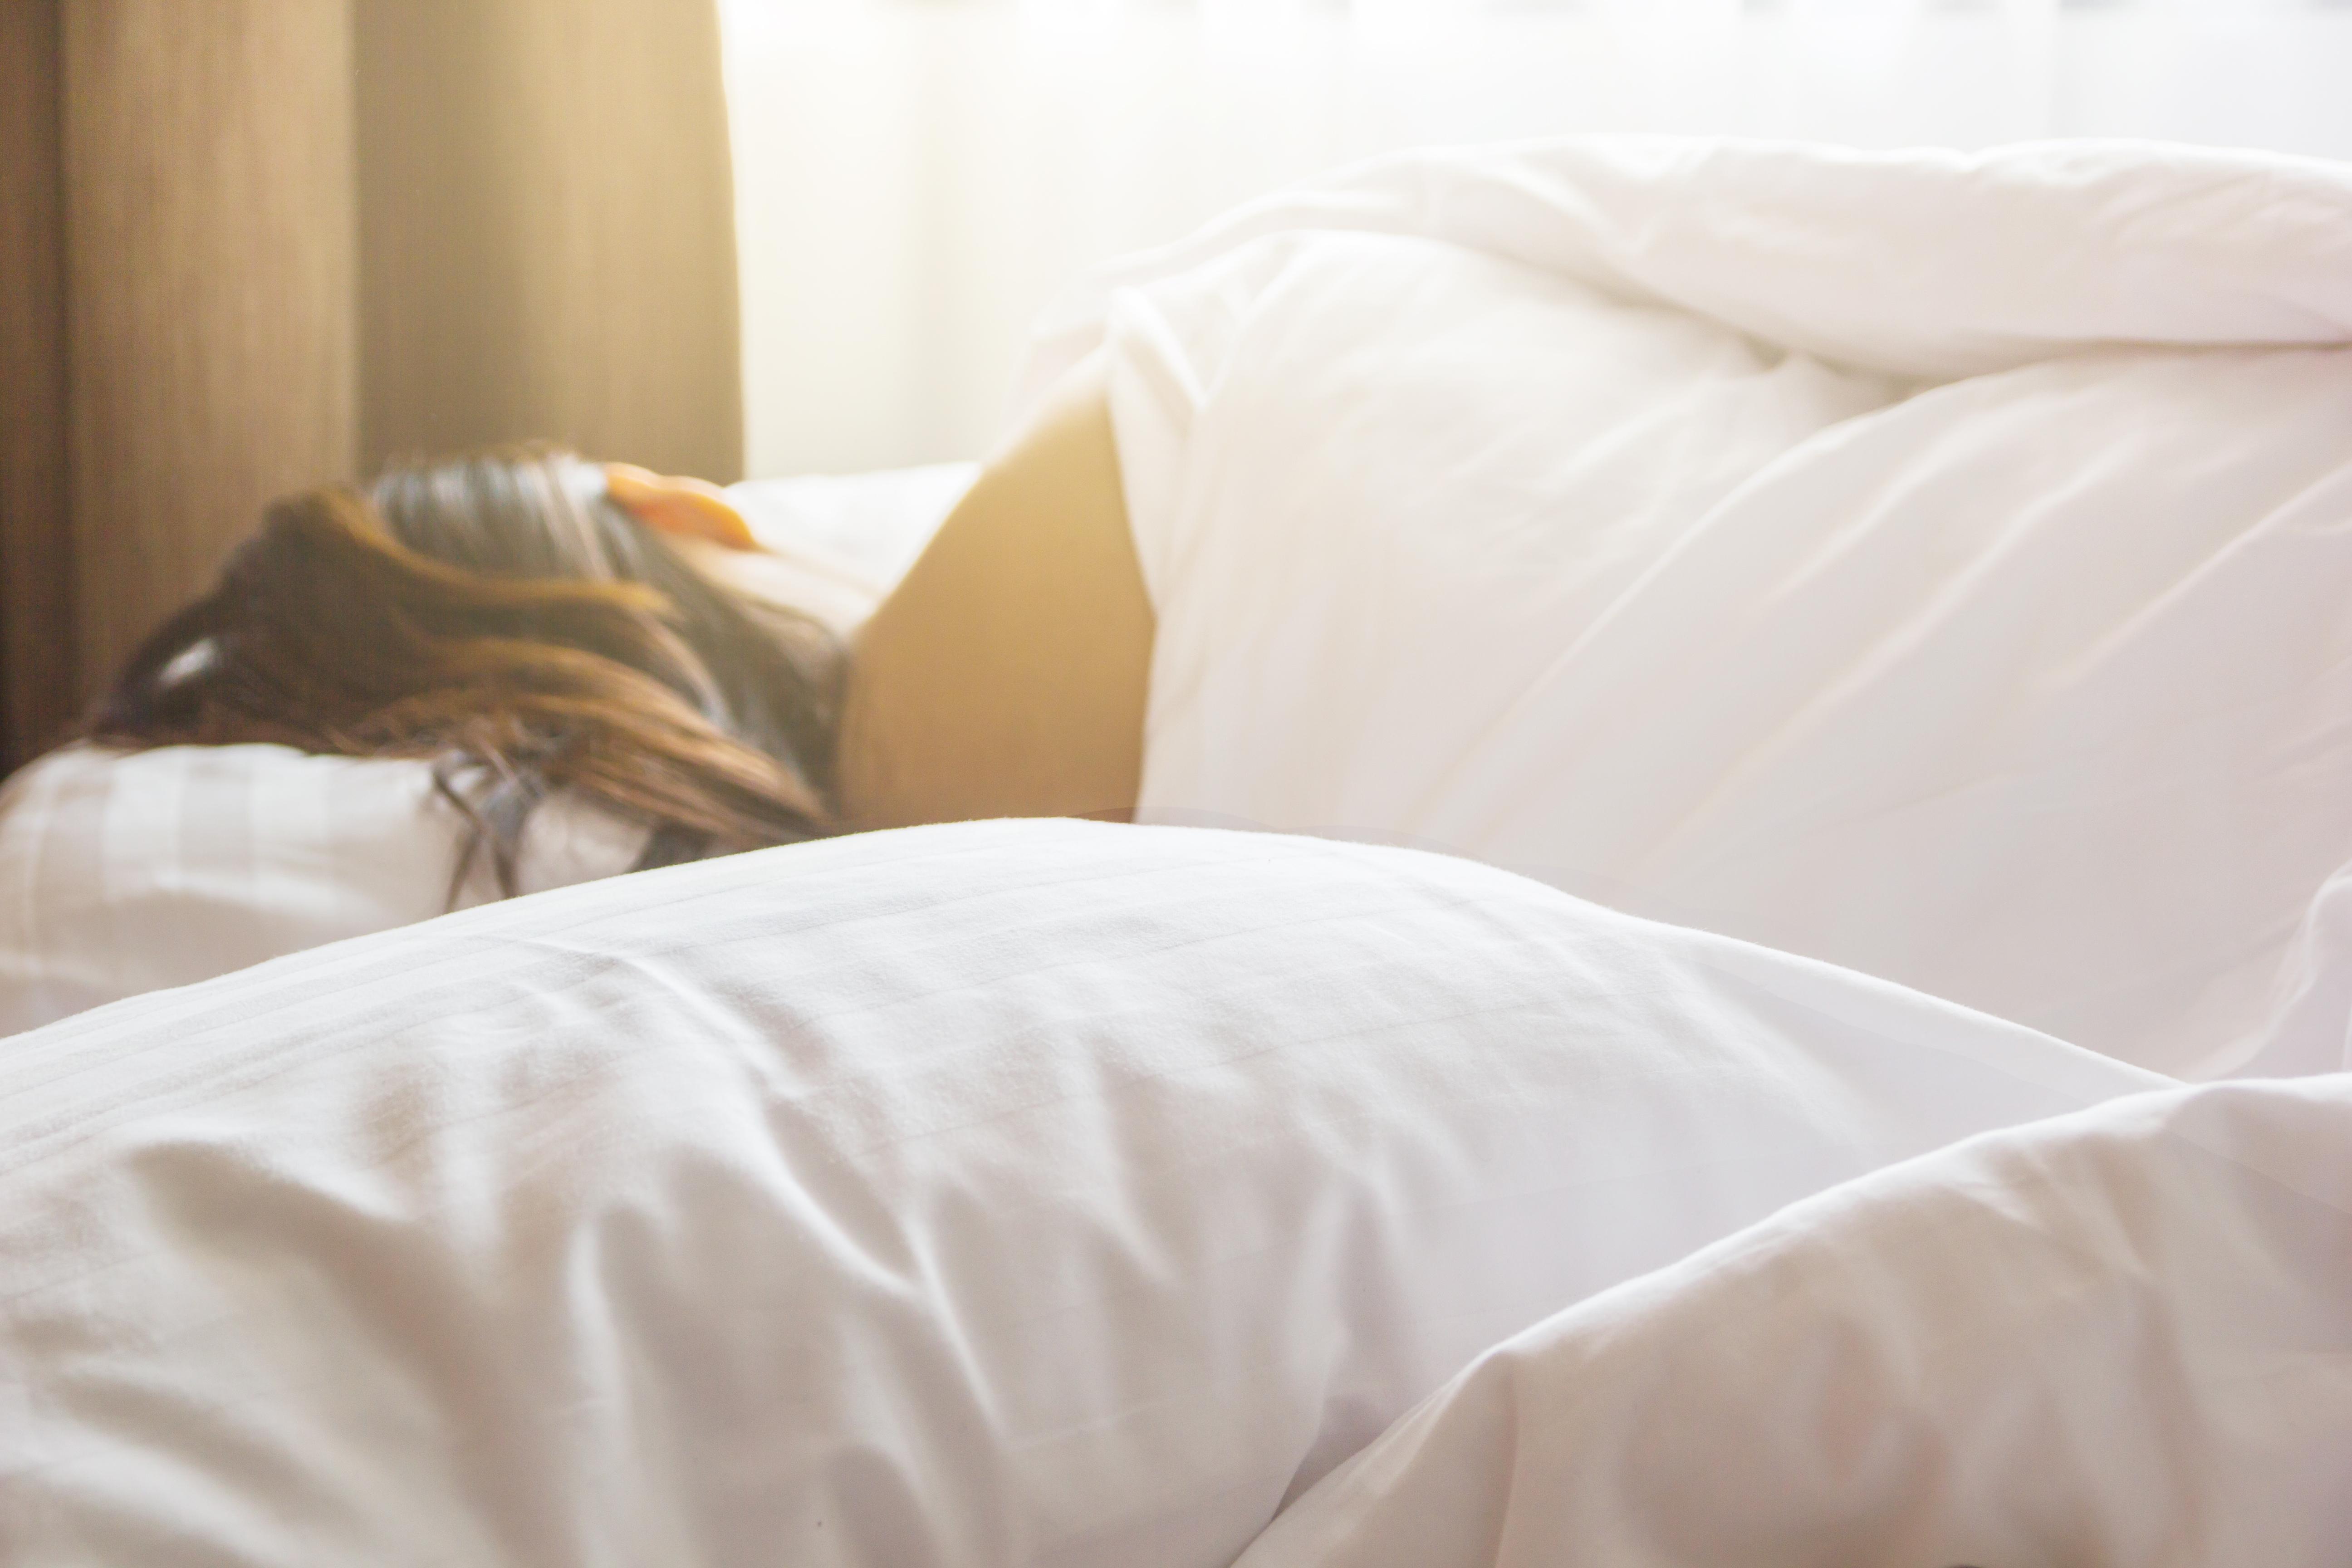 sleeping-cellulite